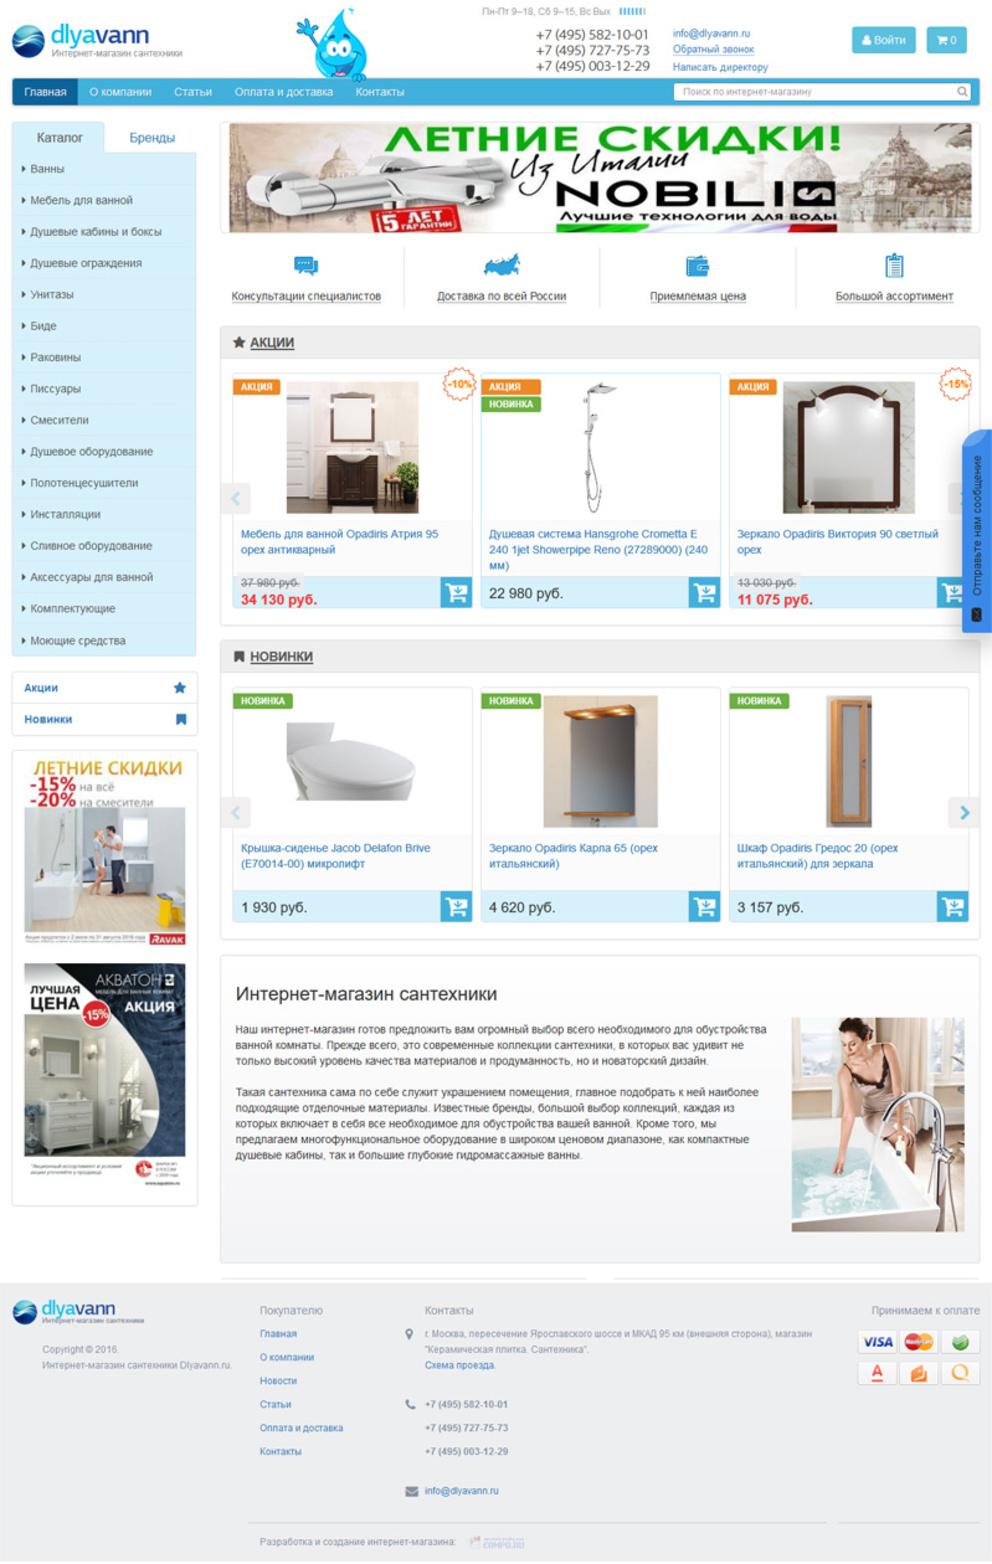 Интернет-магазин сантехники / Проект компании Compo